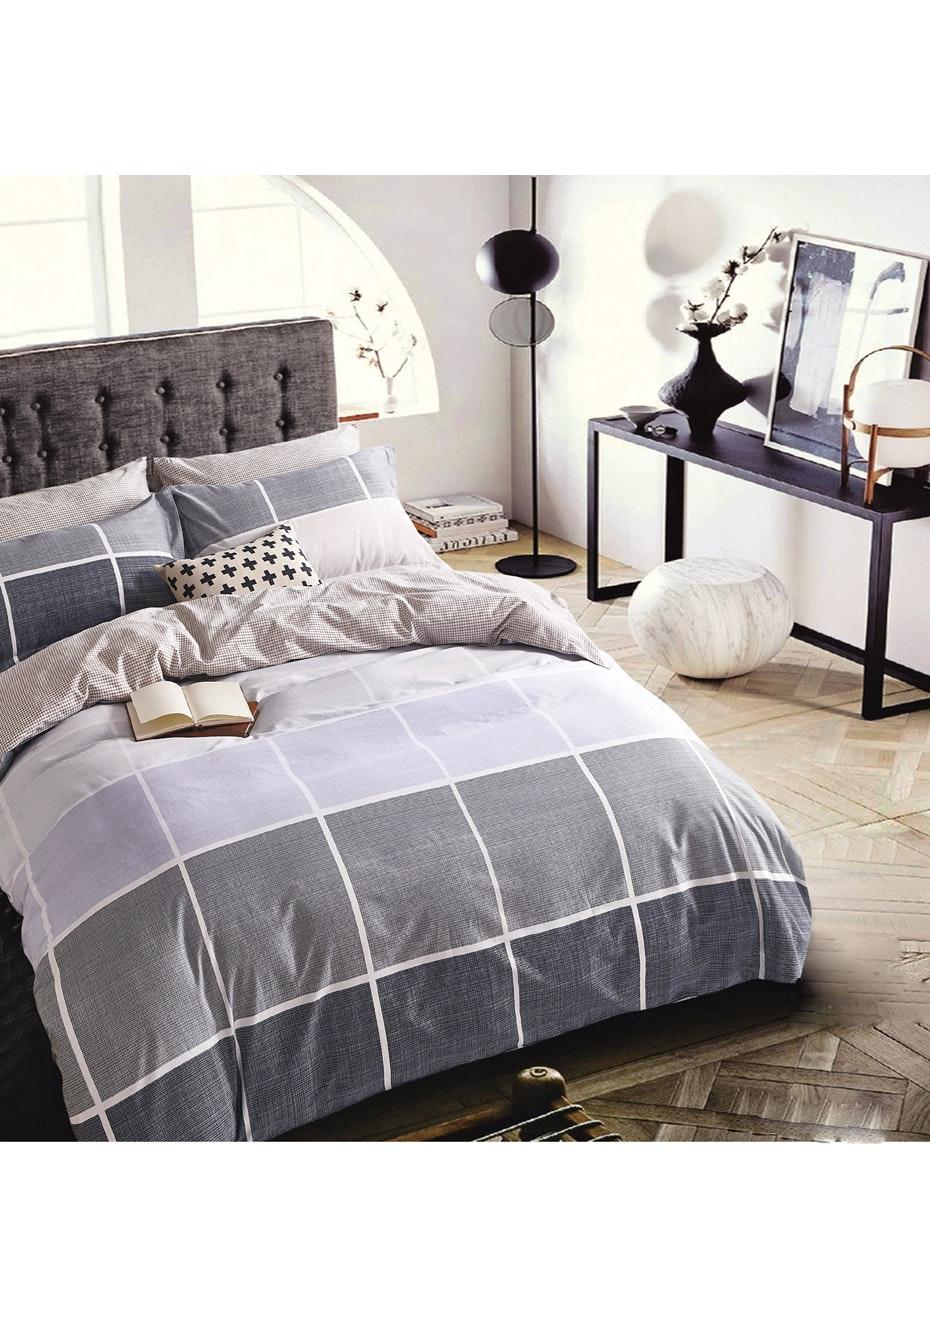 Catalina Quilt Cover Set - Reversible Design - 100% Cotton Queen Bed